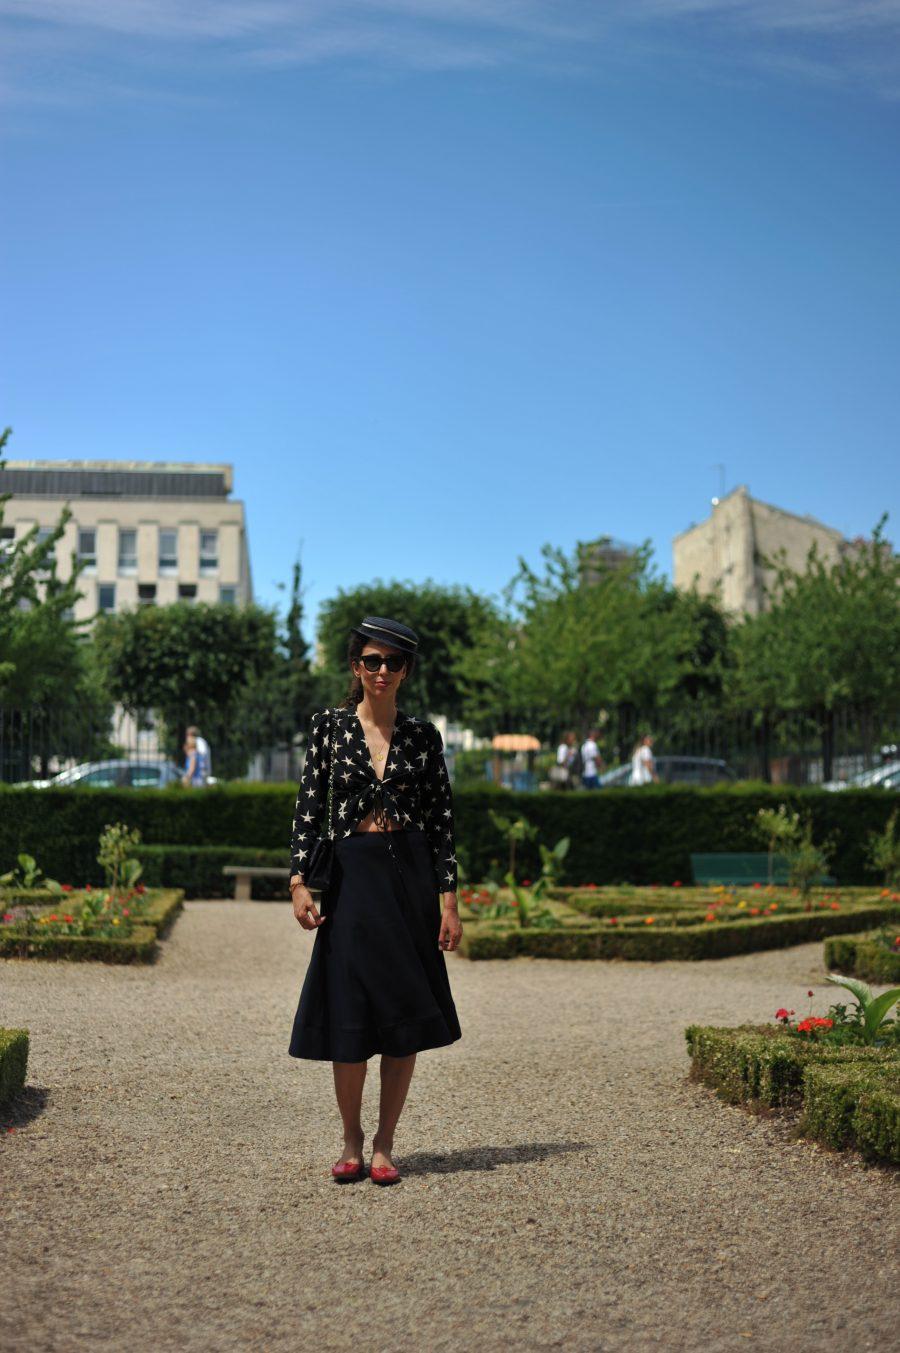 jupe-midi-parisienne-cheminsblancs-15